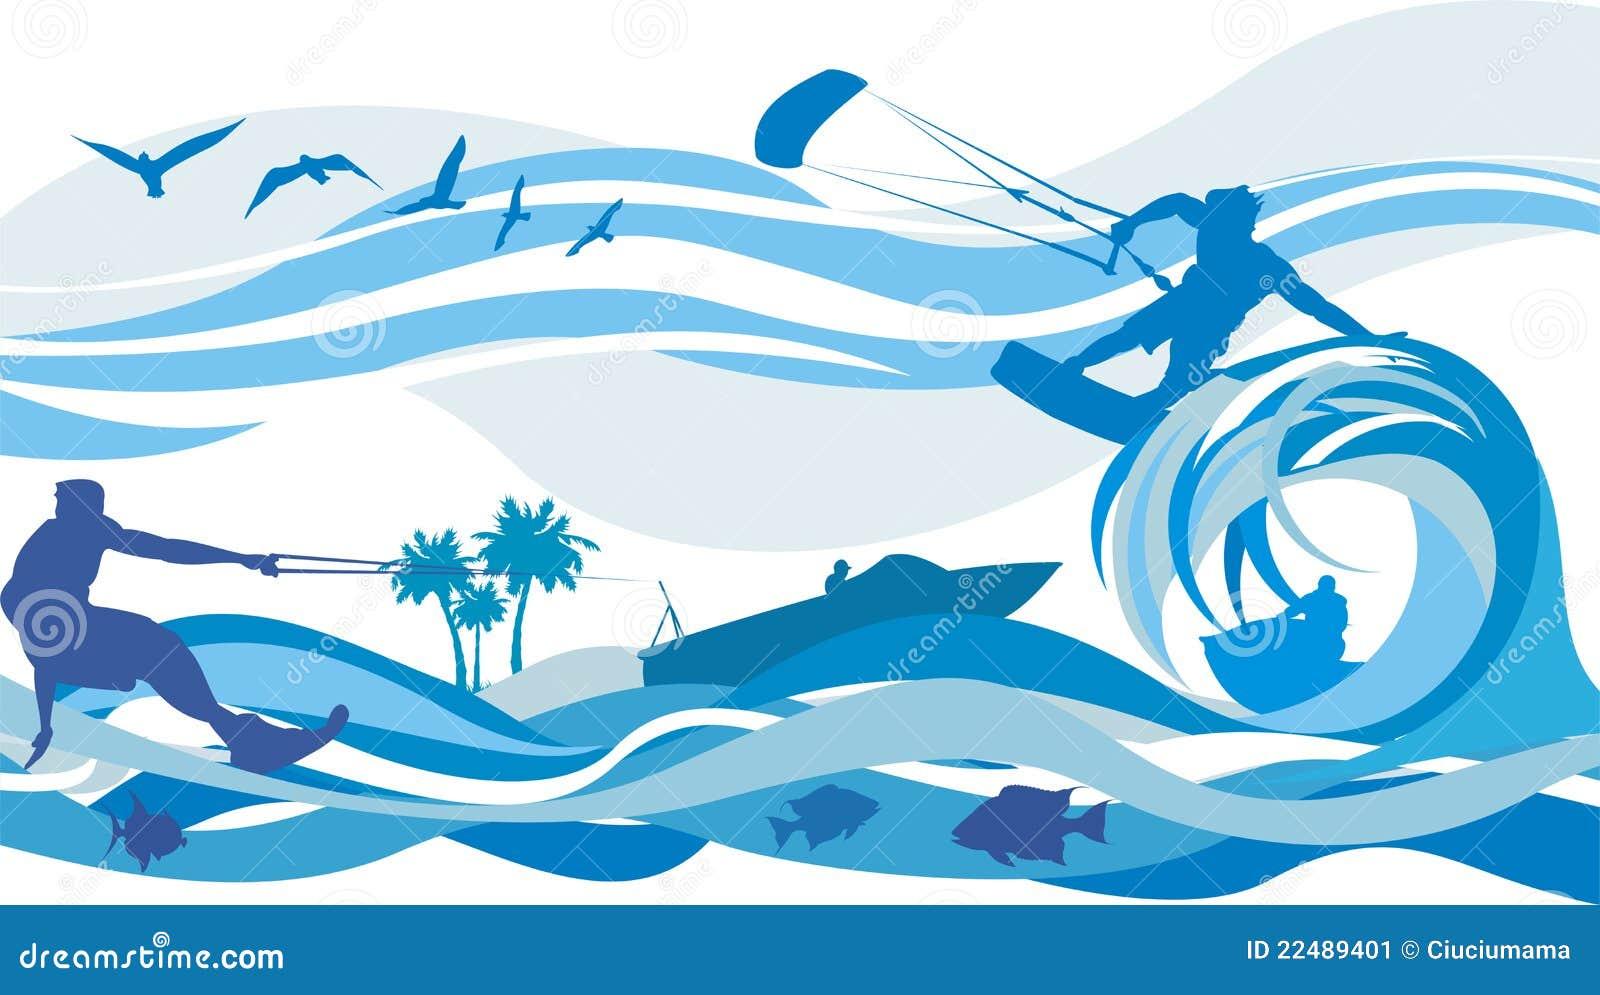 Windsurf Disegno: Kite Surfing, Water Skiing, Jet Stock